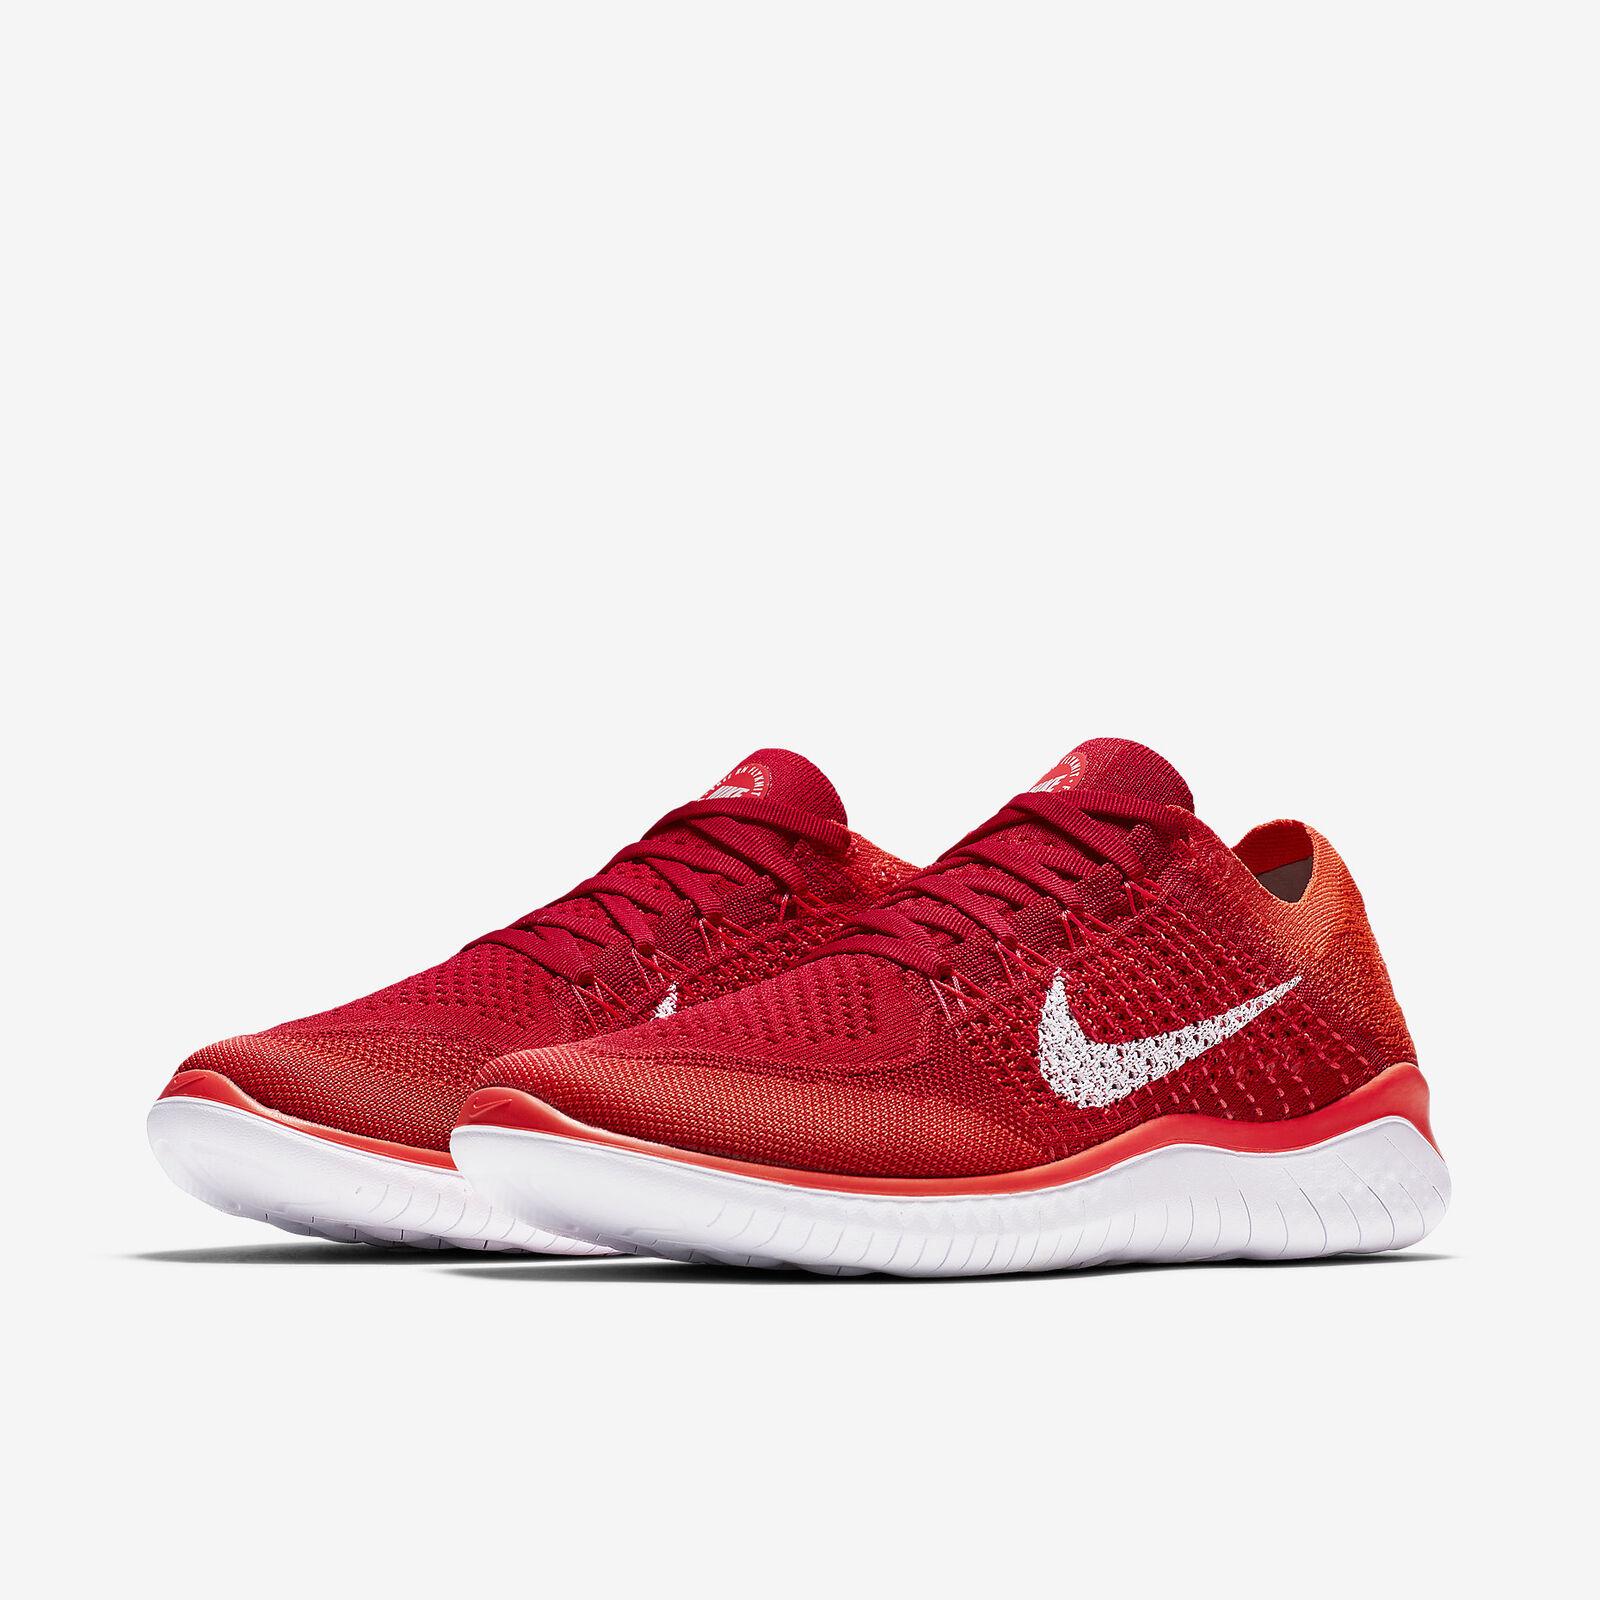 Nike Free RN Flyknit 2018 University Red/Bright Crimson Mens Running All NEW